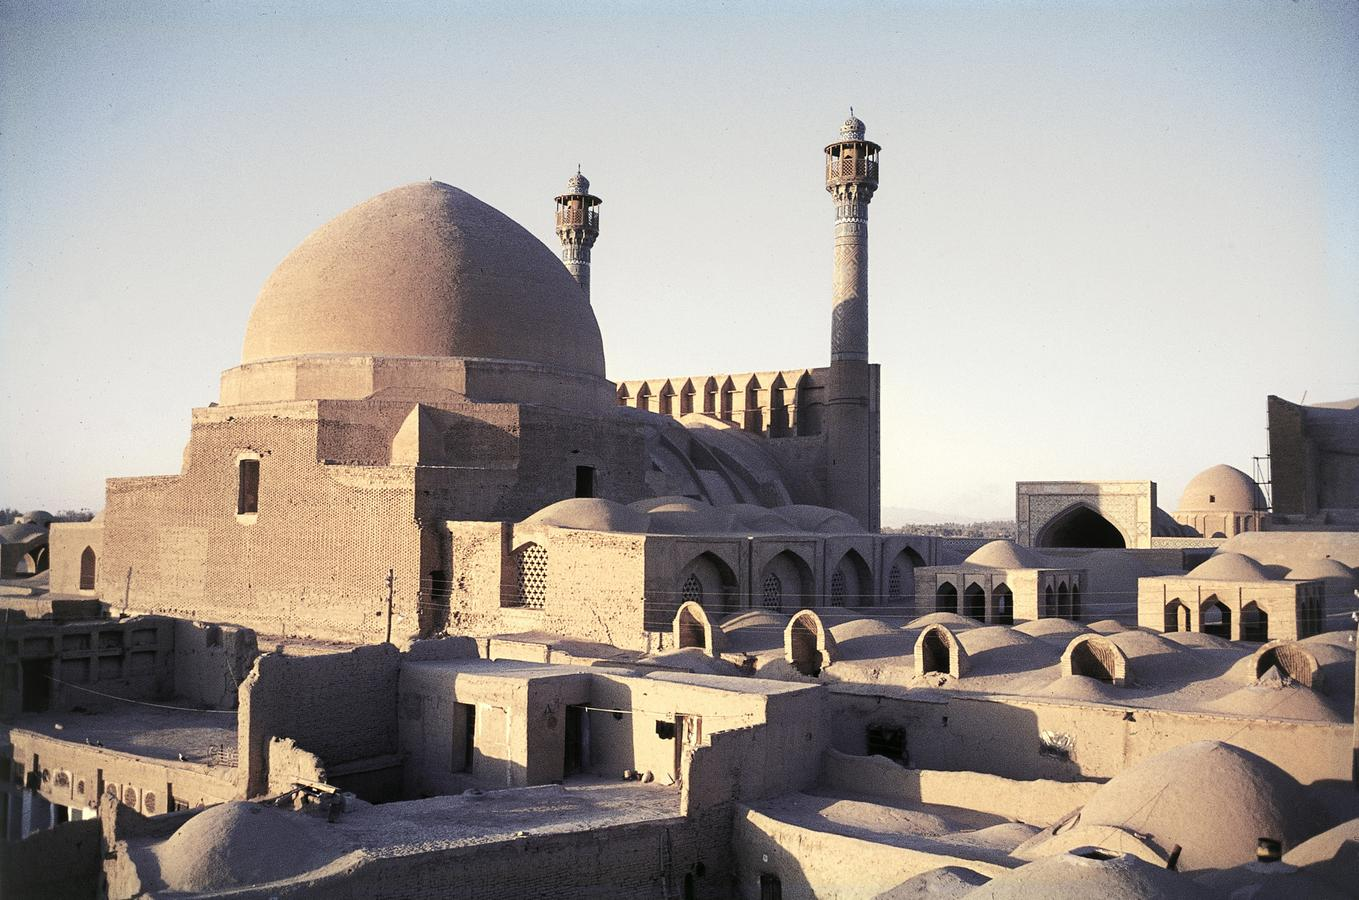 11Fredagsmoskeen_-Isfahan-_kuplen__-Iran.-HMH.jpg